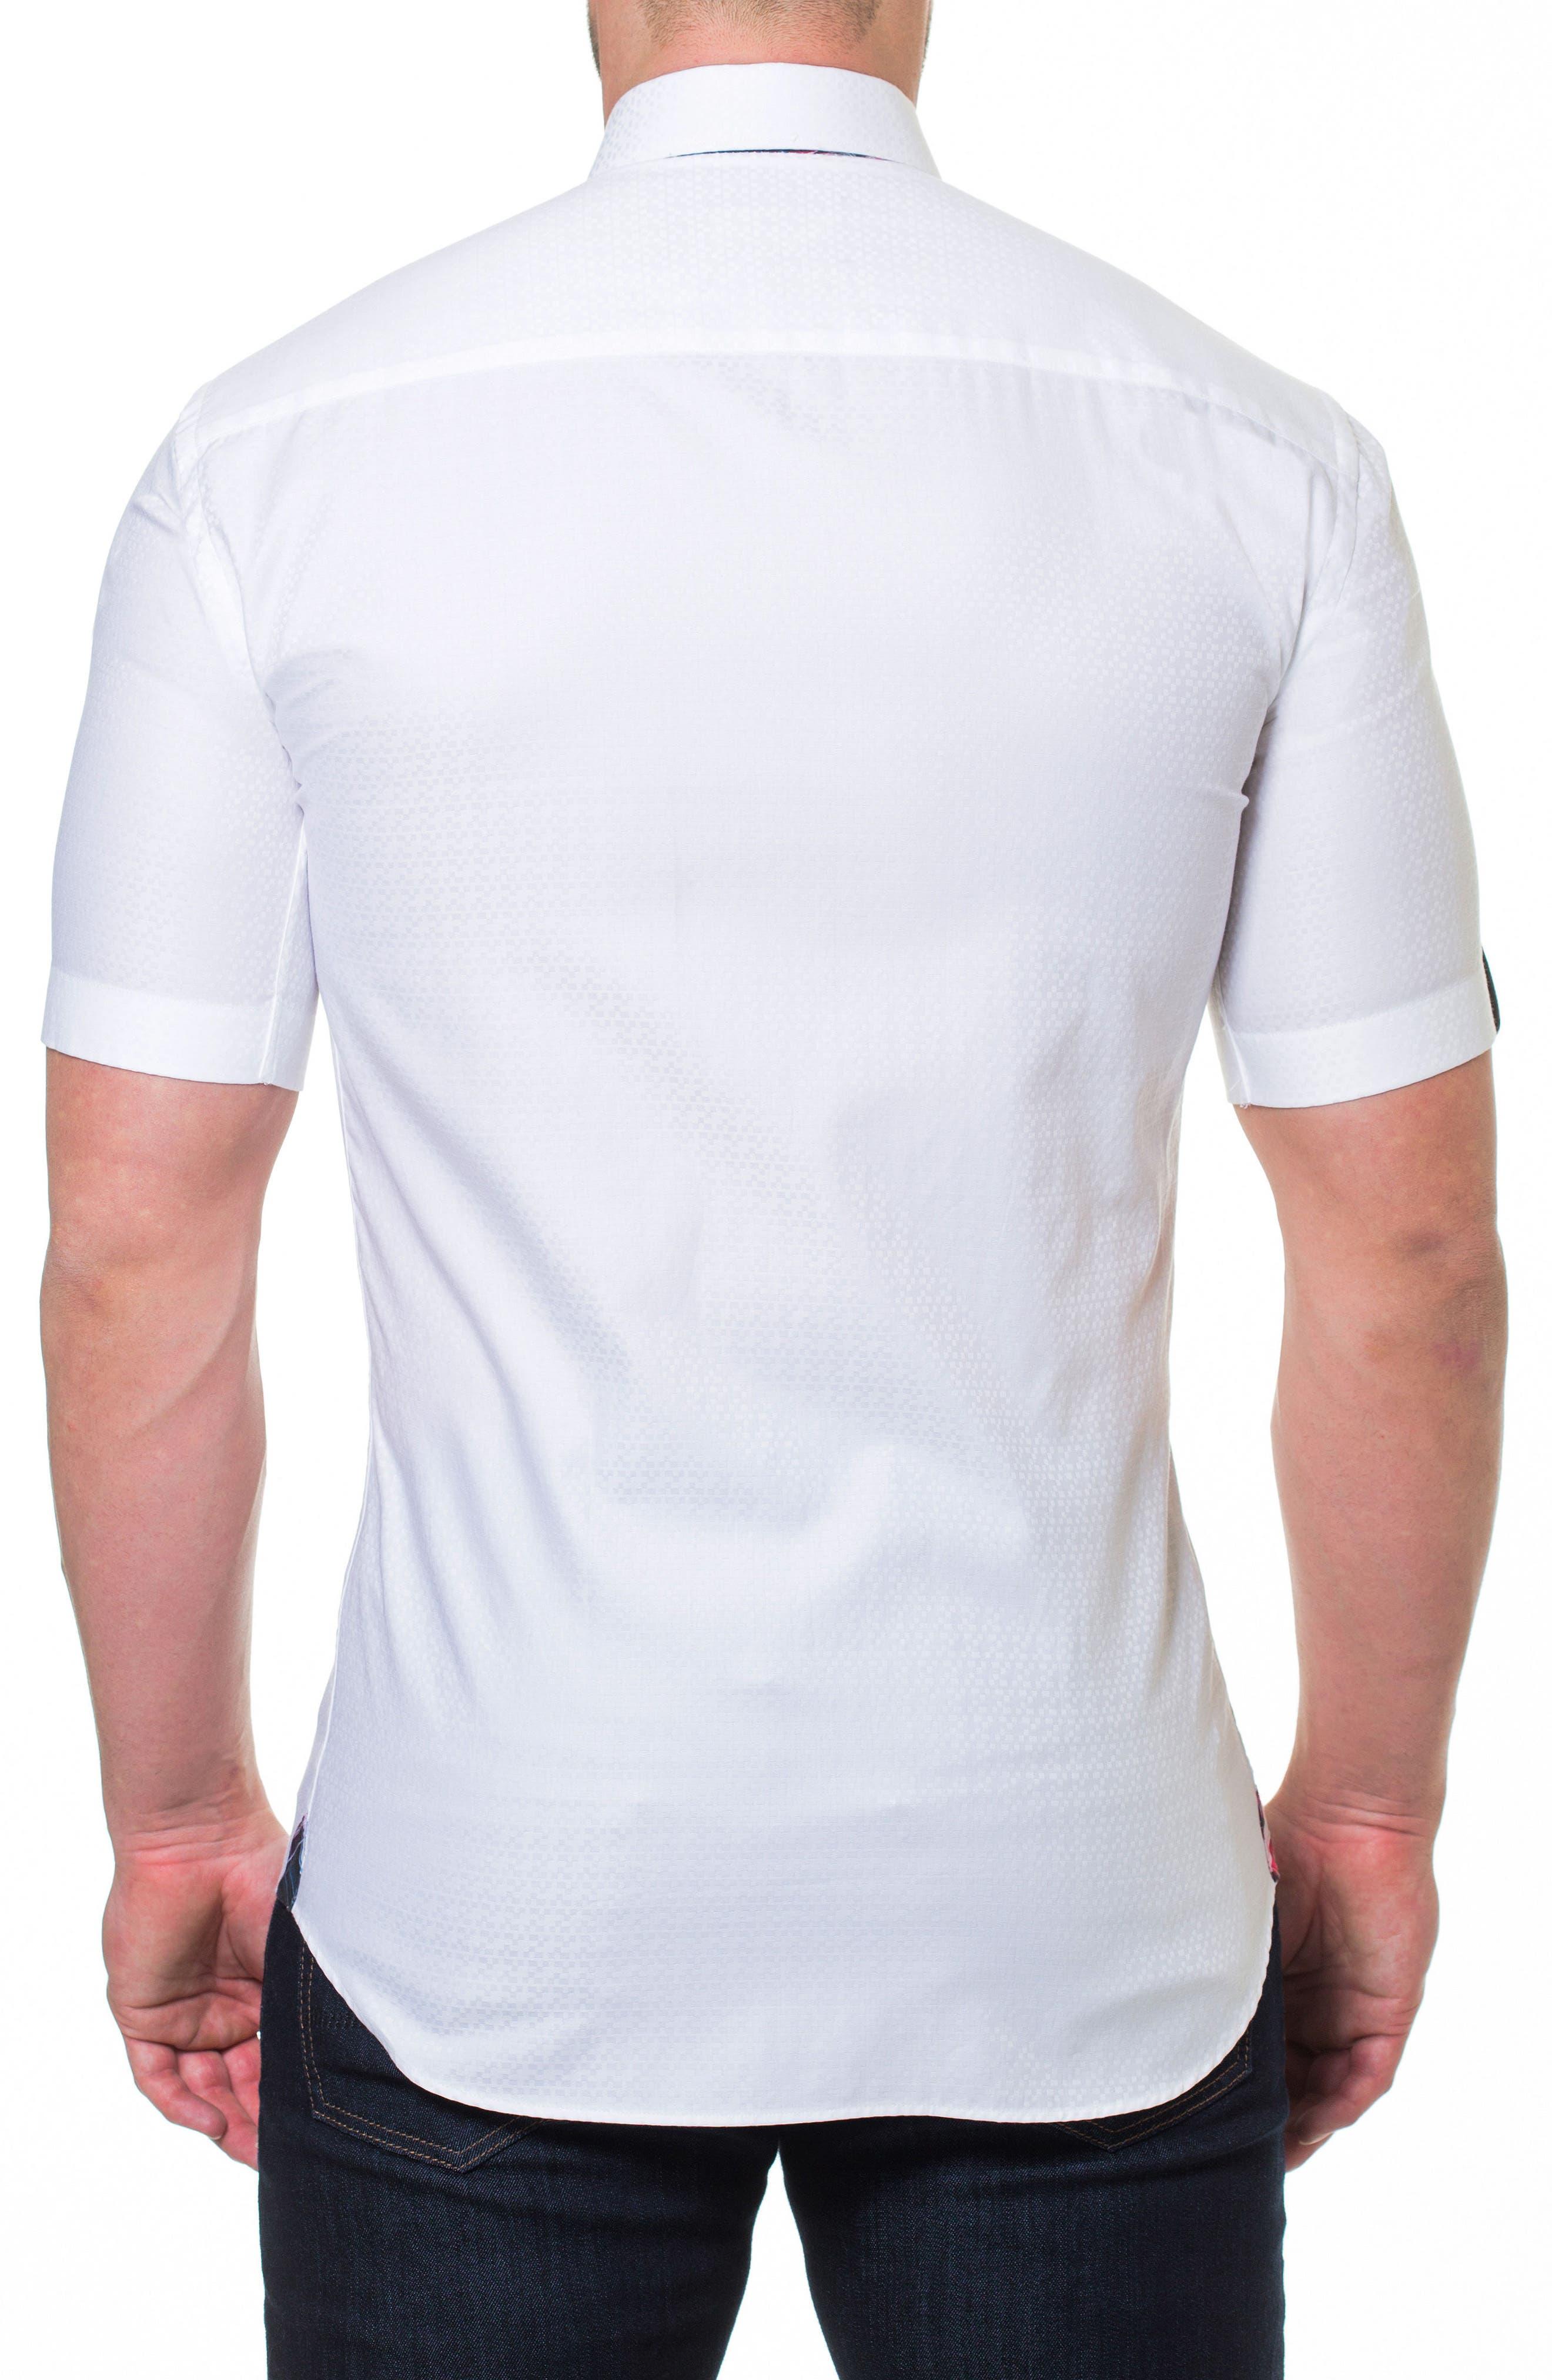 Fresh Block Sport Shirt,                             Alternate thumbnail 2, color,                             110